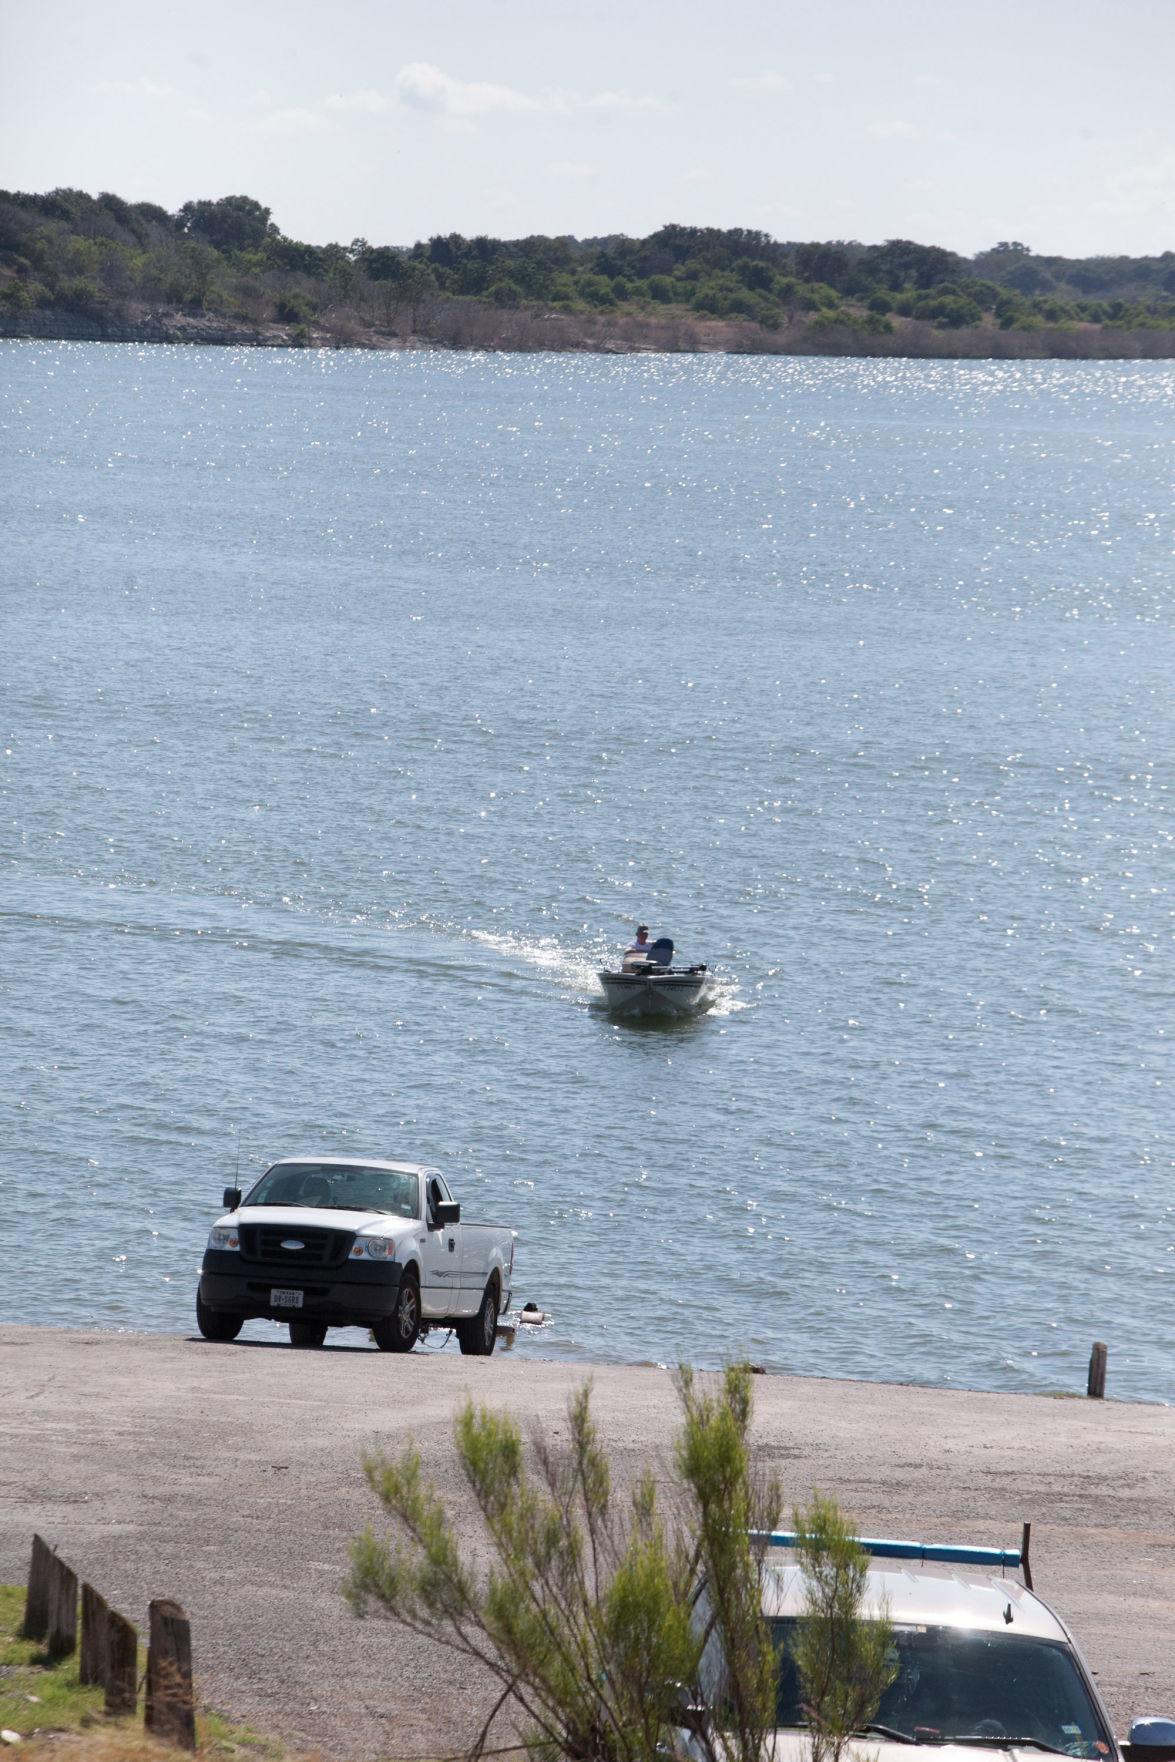 4 More Parks, Ramps Open At Belton Lake